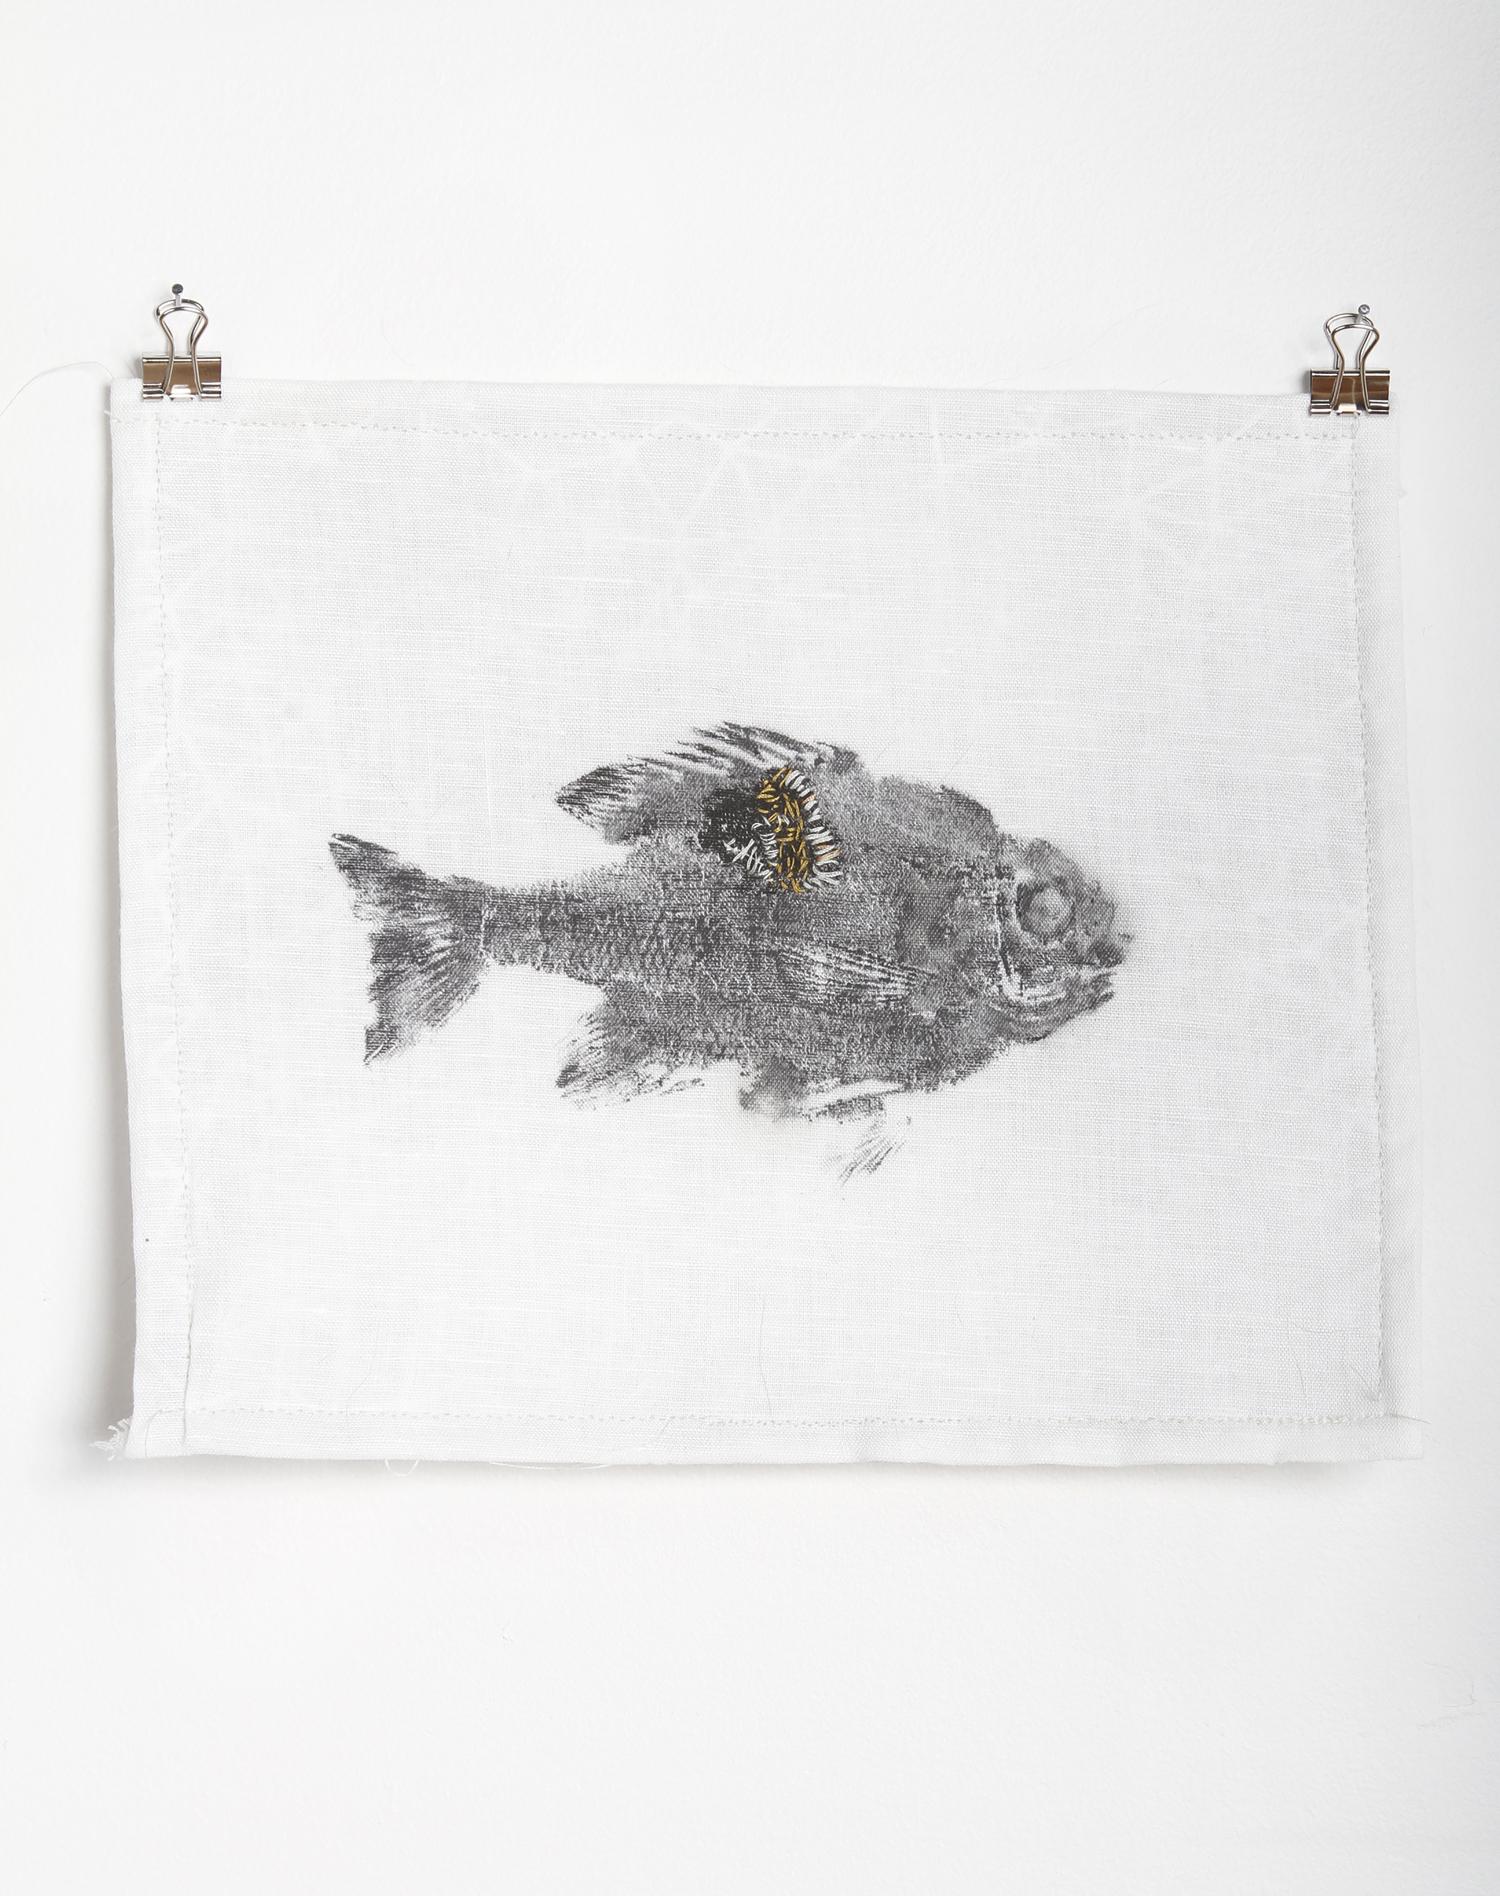 gyotaku fish print with hand embroidery